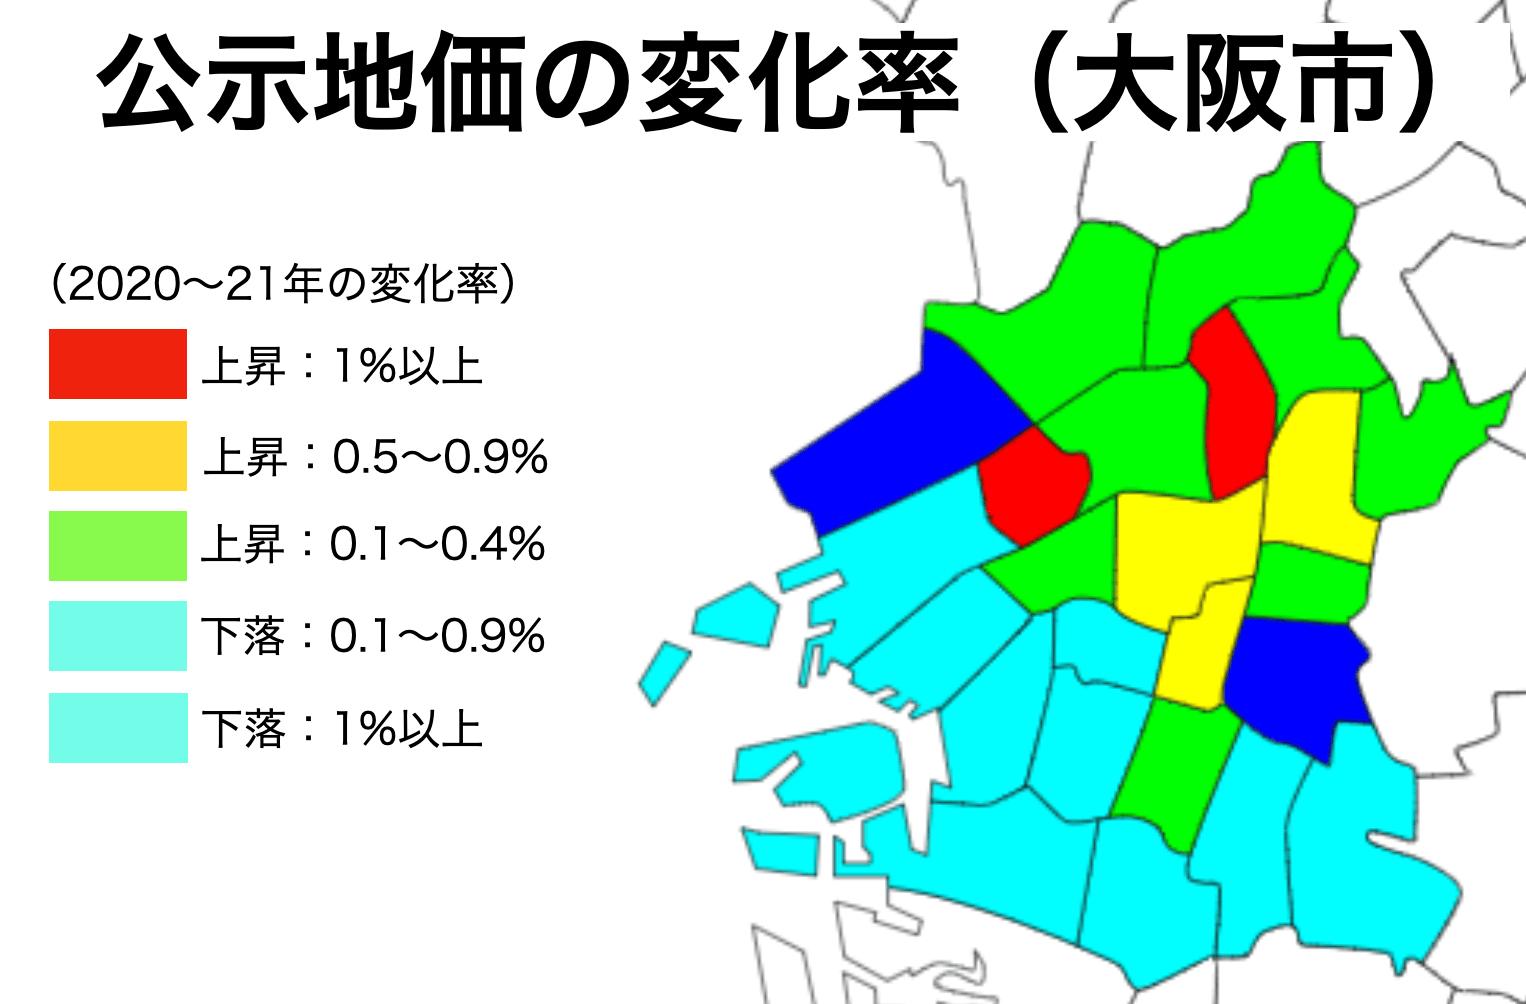 大阪市の公示地価の前年比変化率